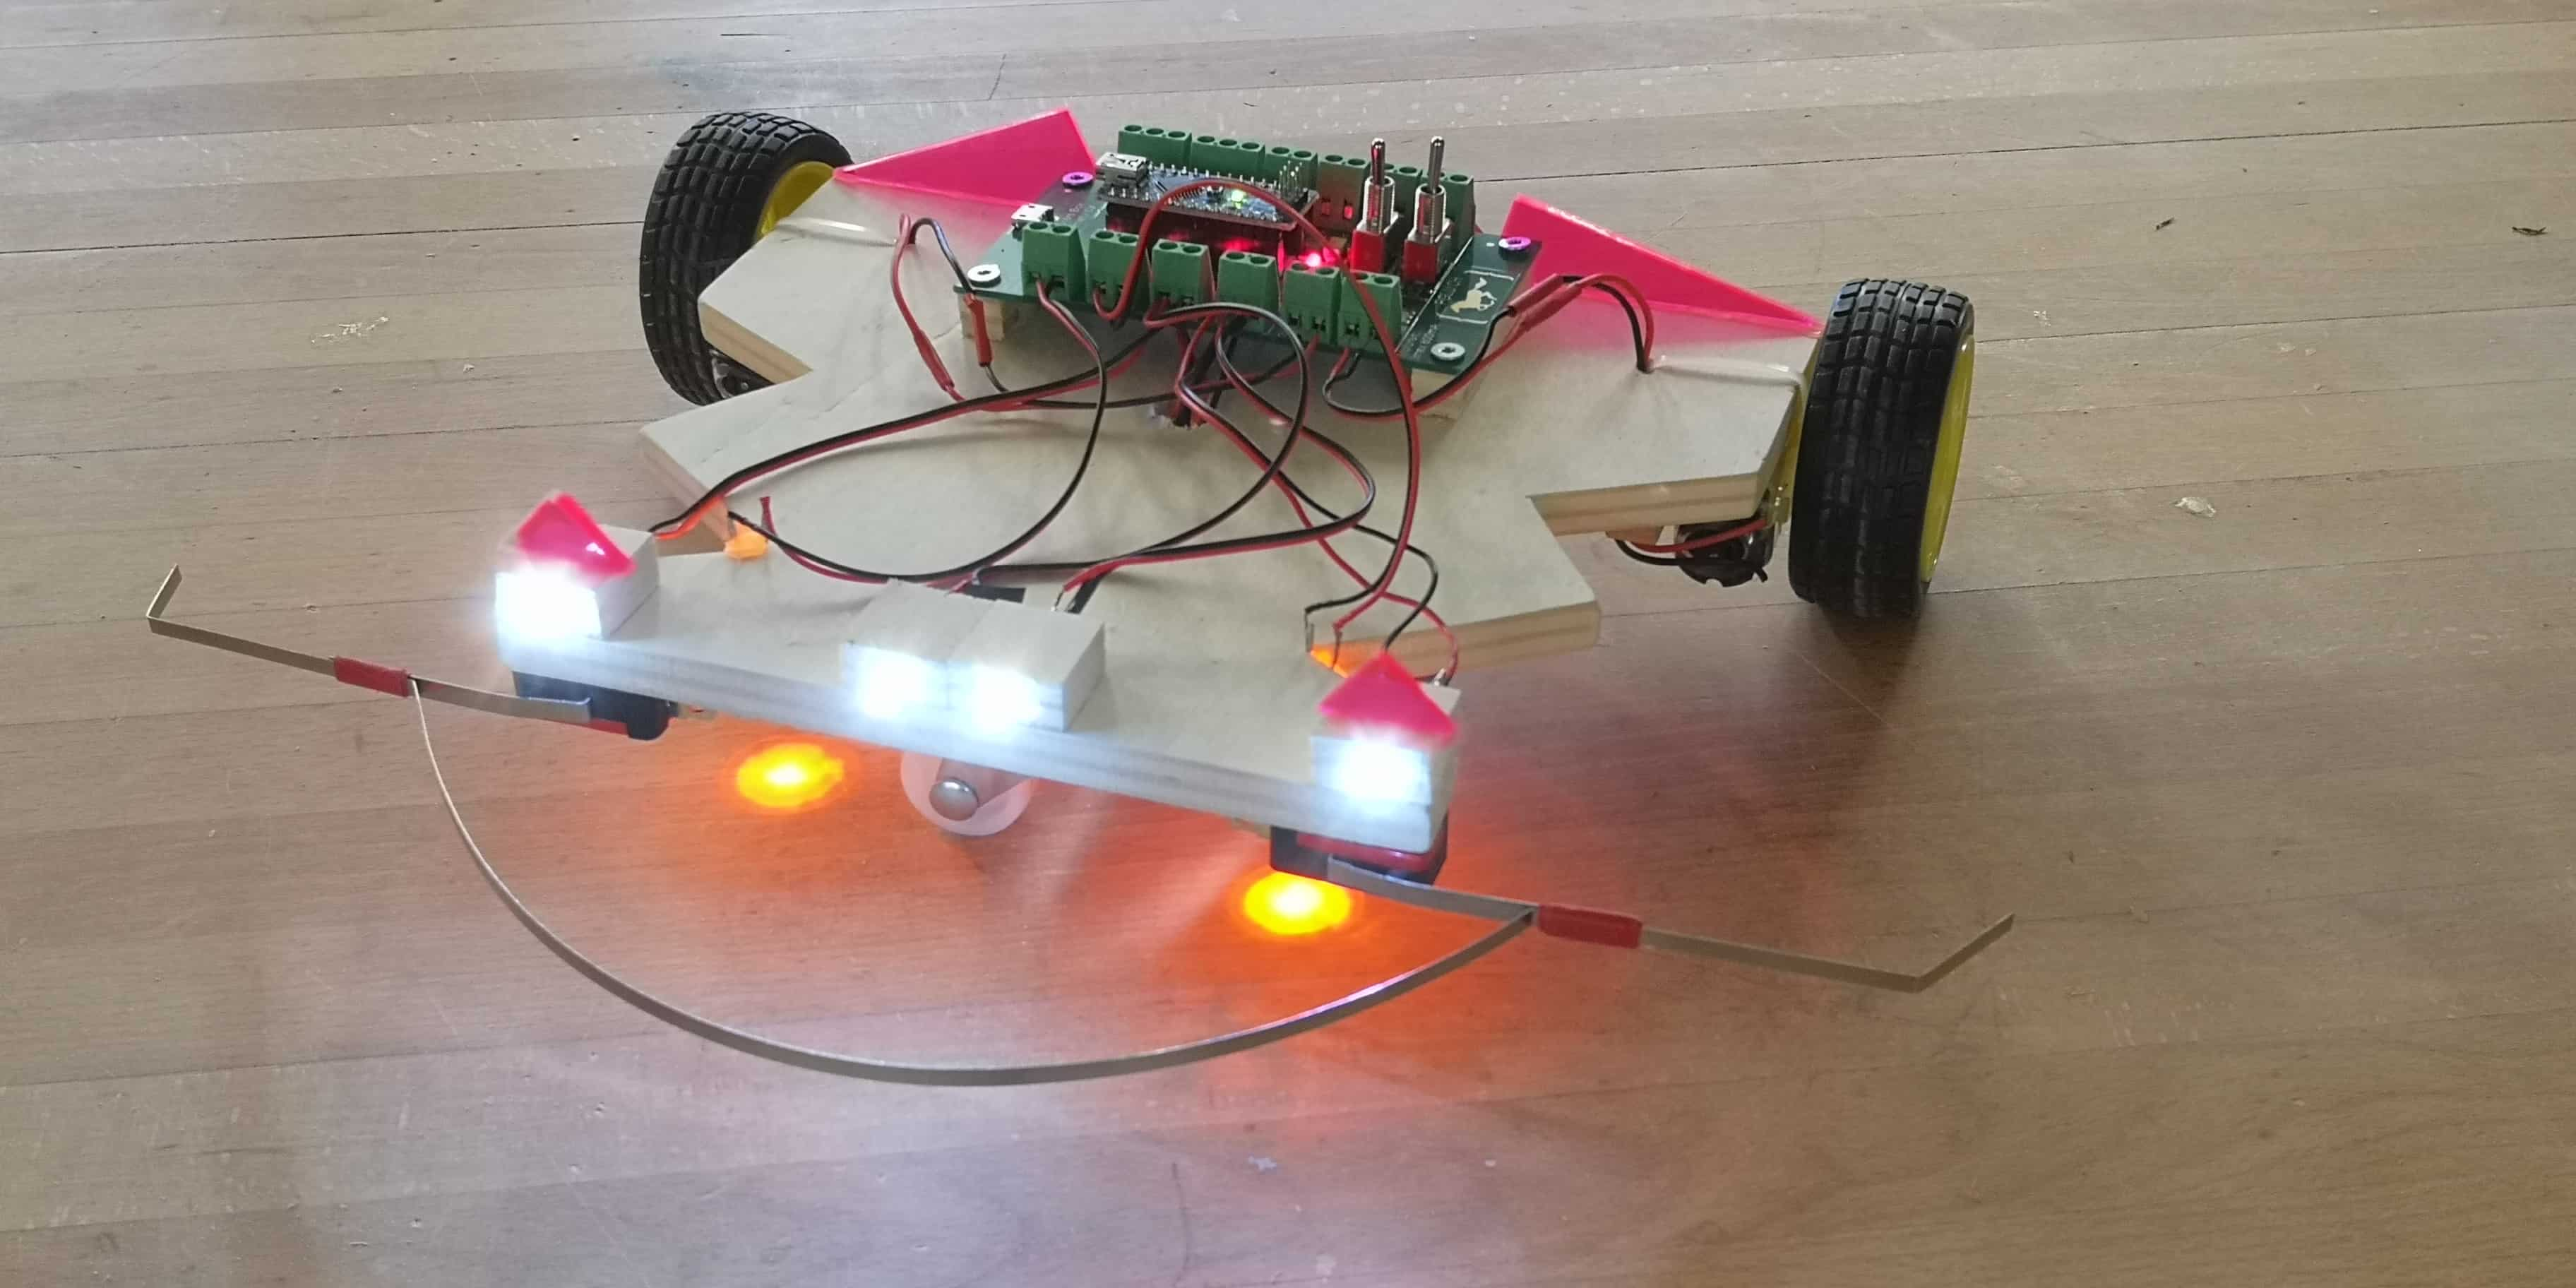 Werkideen: Bausatz Arduino Roboter zum selber bauen.